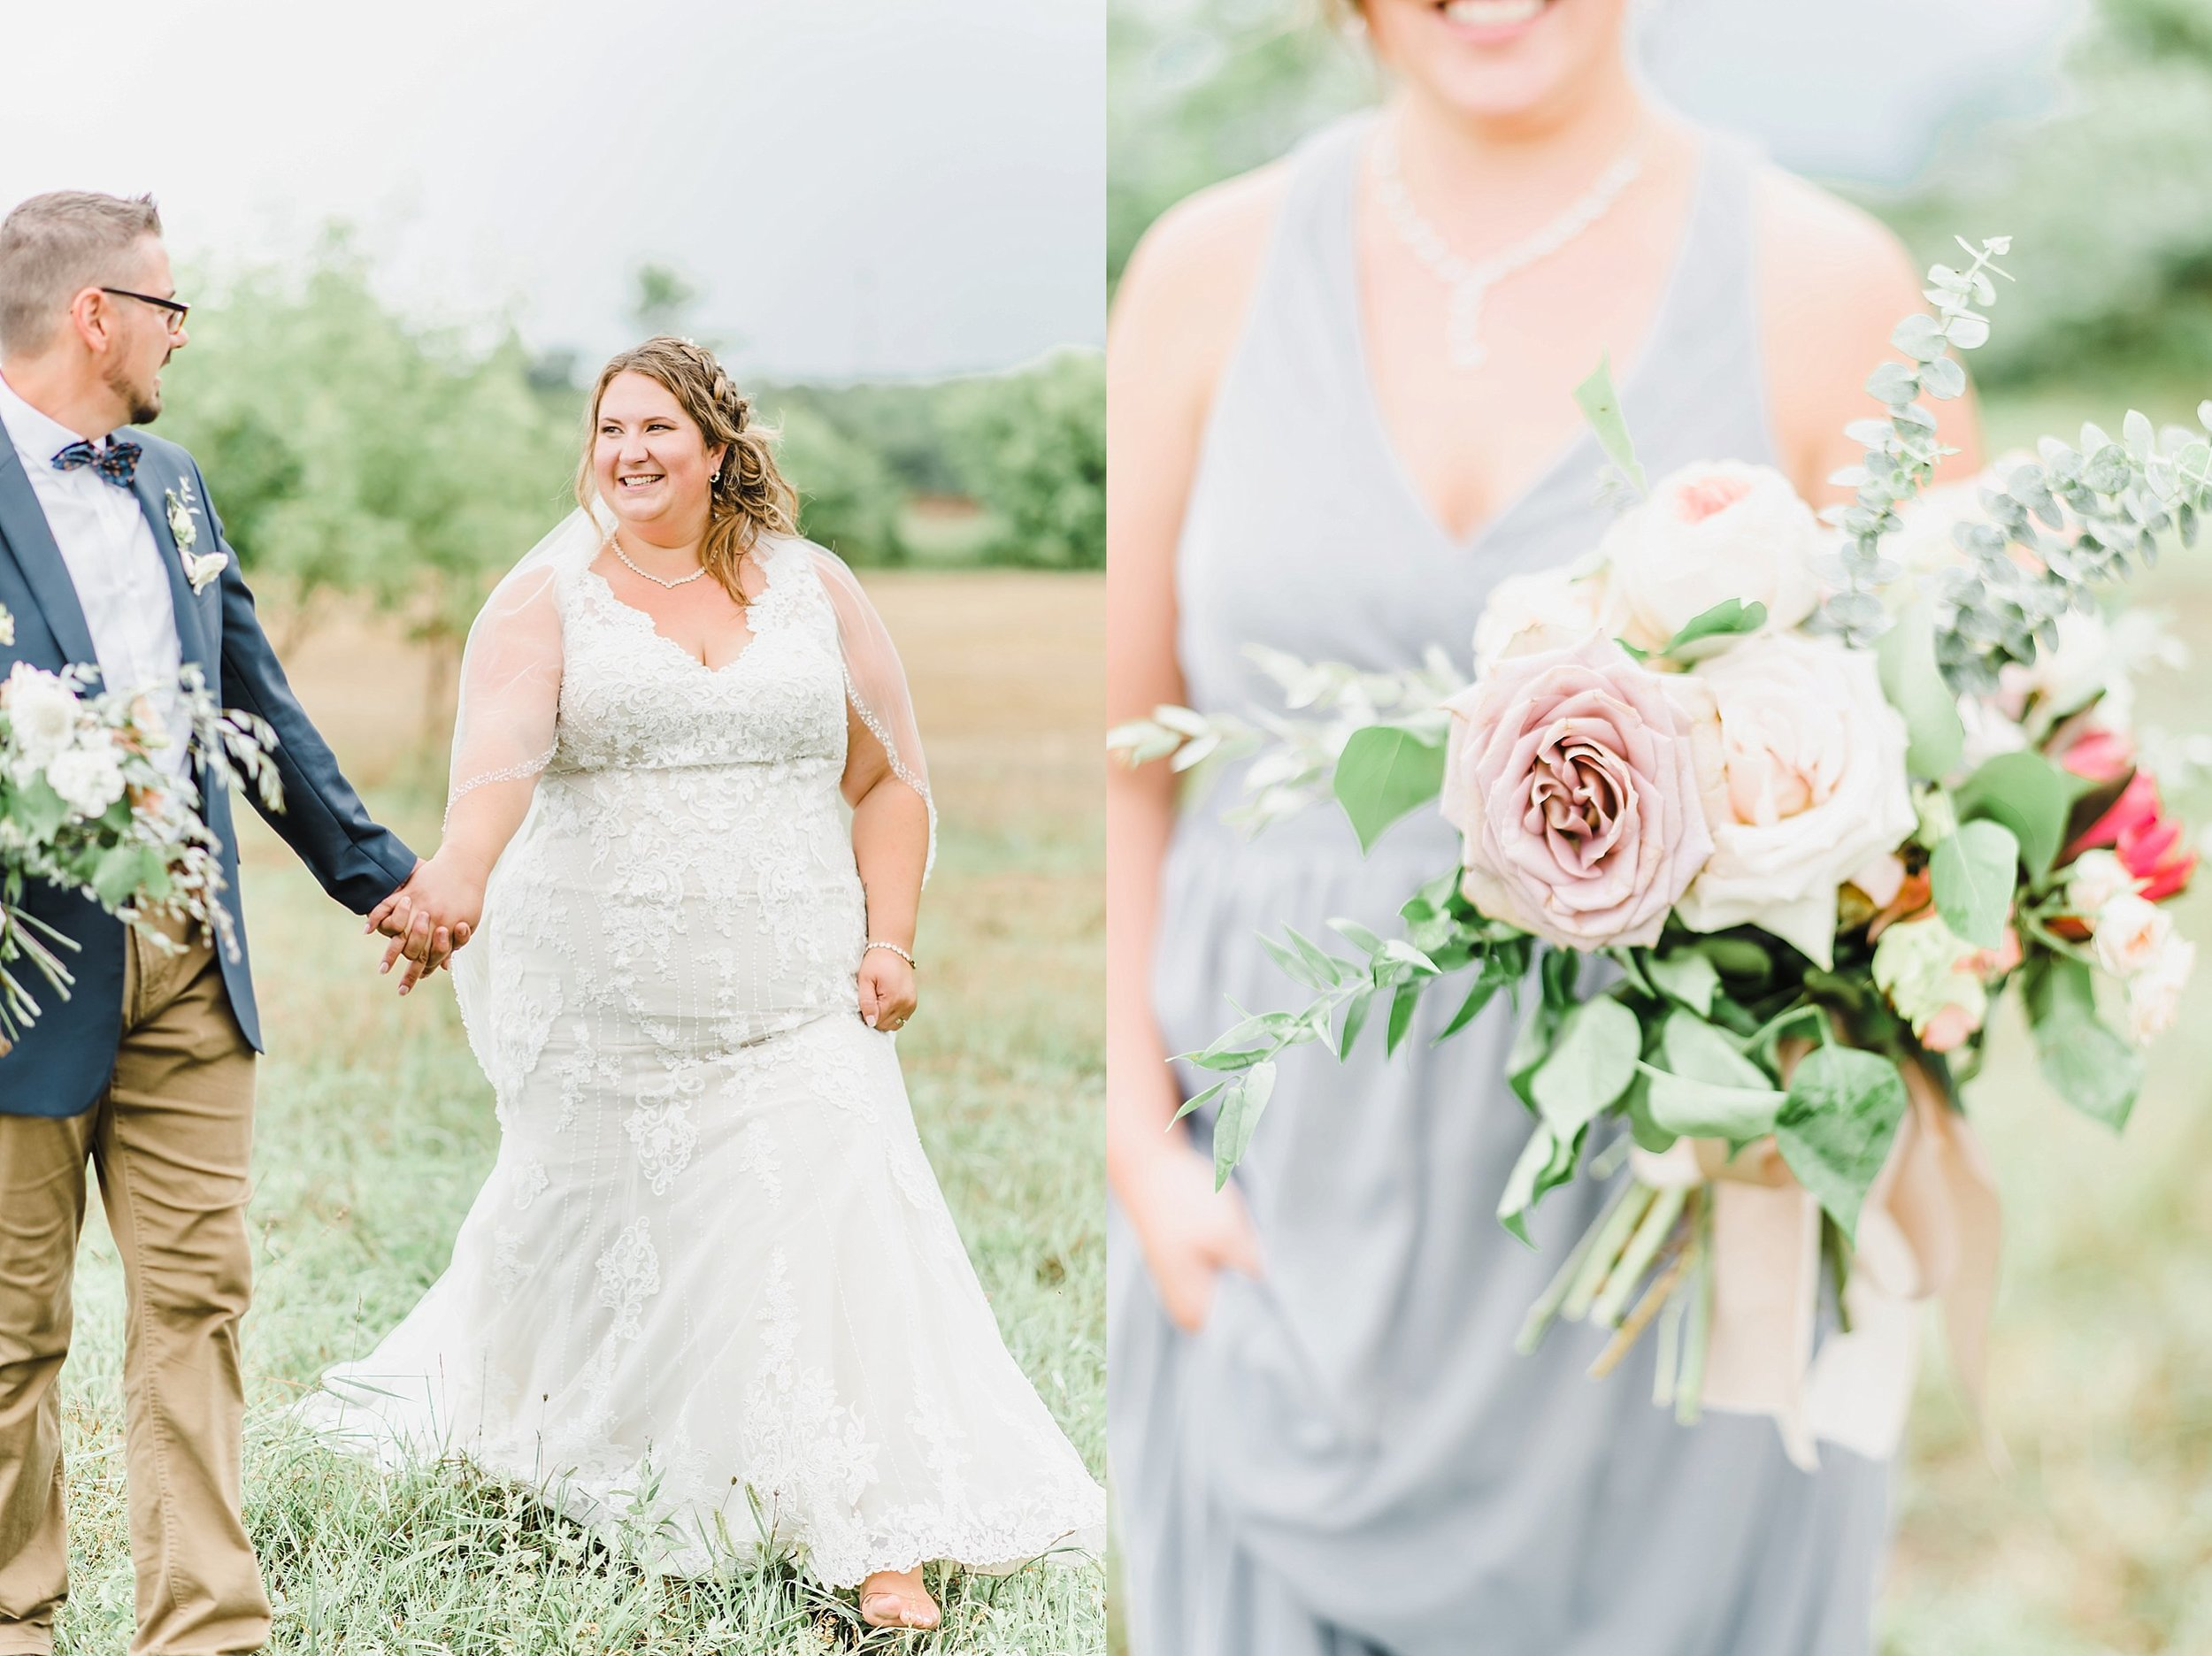 light airy indie fine art ottawa wedding photographer | Ali and Batoul Photography_0415.jpg